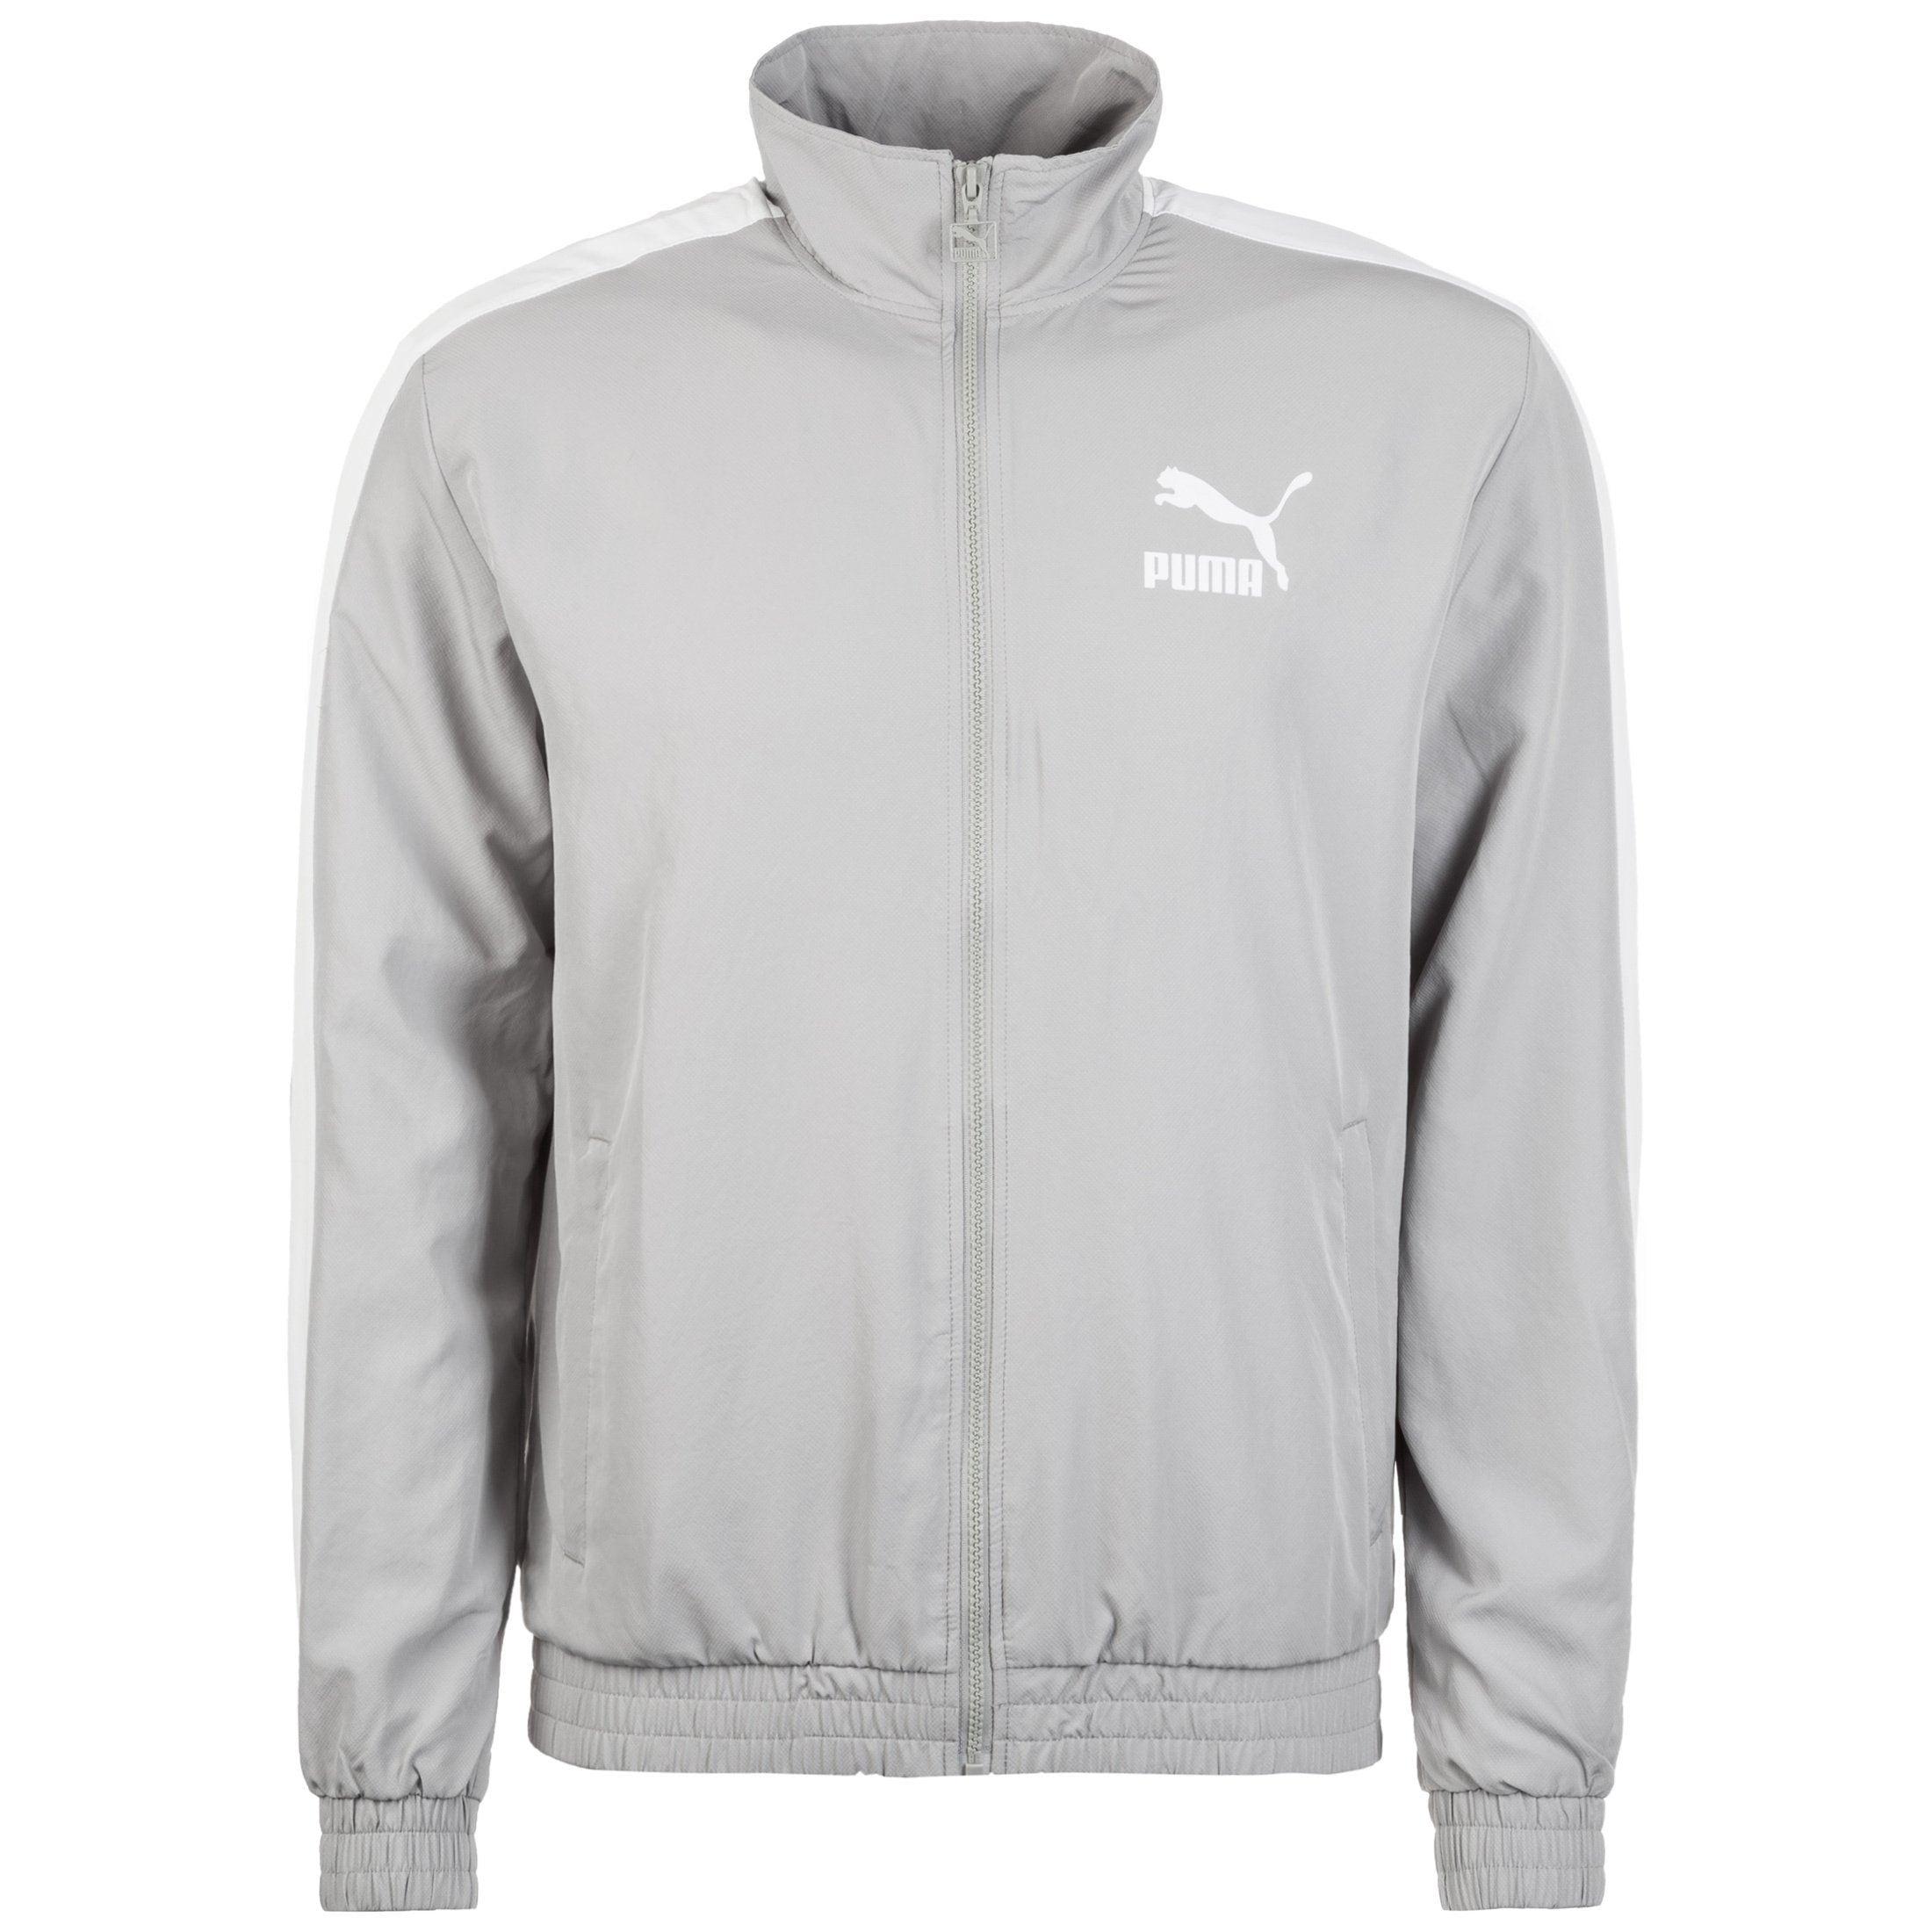 PUMA Sweatjacke Iconic T7 Herren | Bekleidung > Sweatshirts & -jacken > Sweatjacken | Grau | Puma